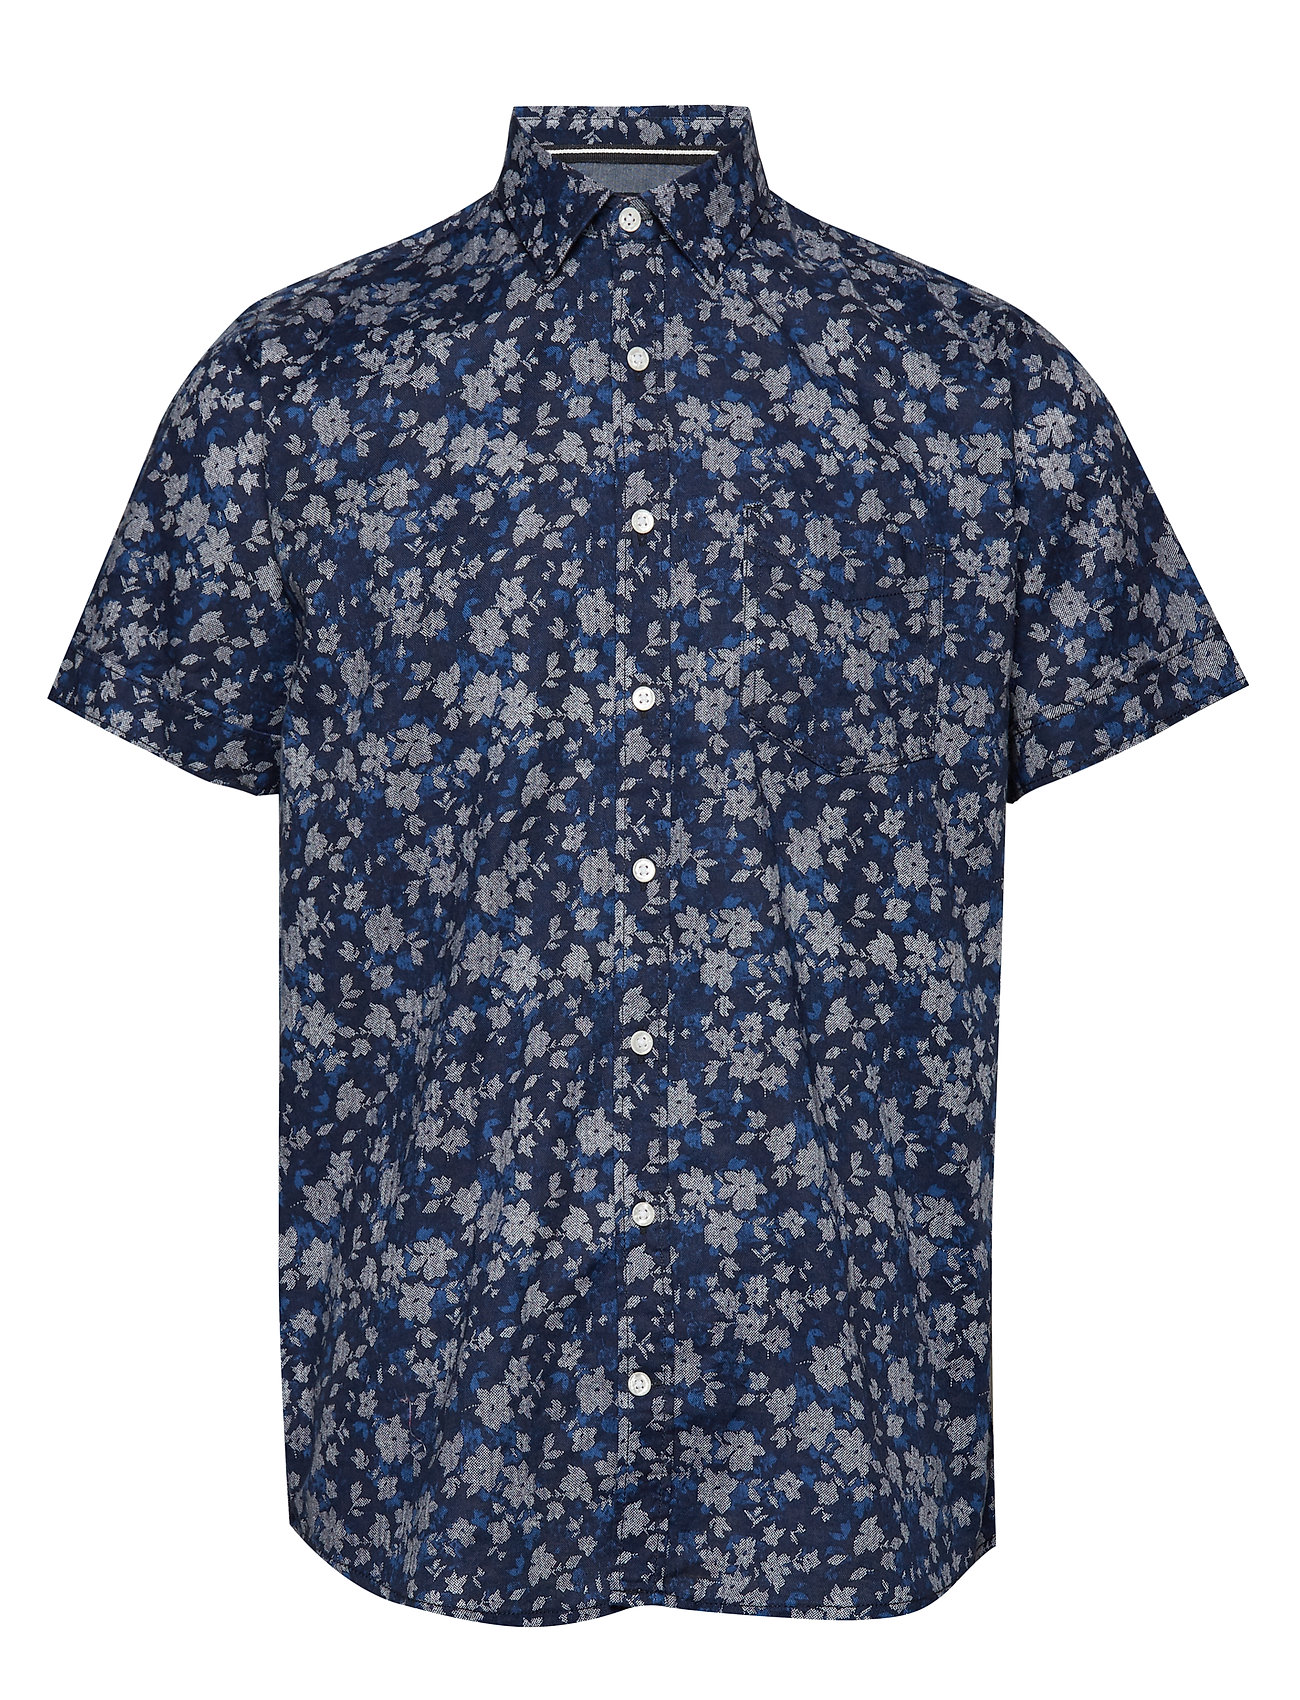 Signal S/S Shirts - DUKE BLUE